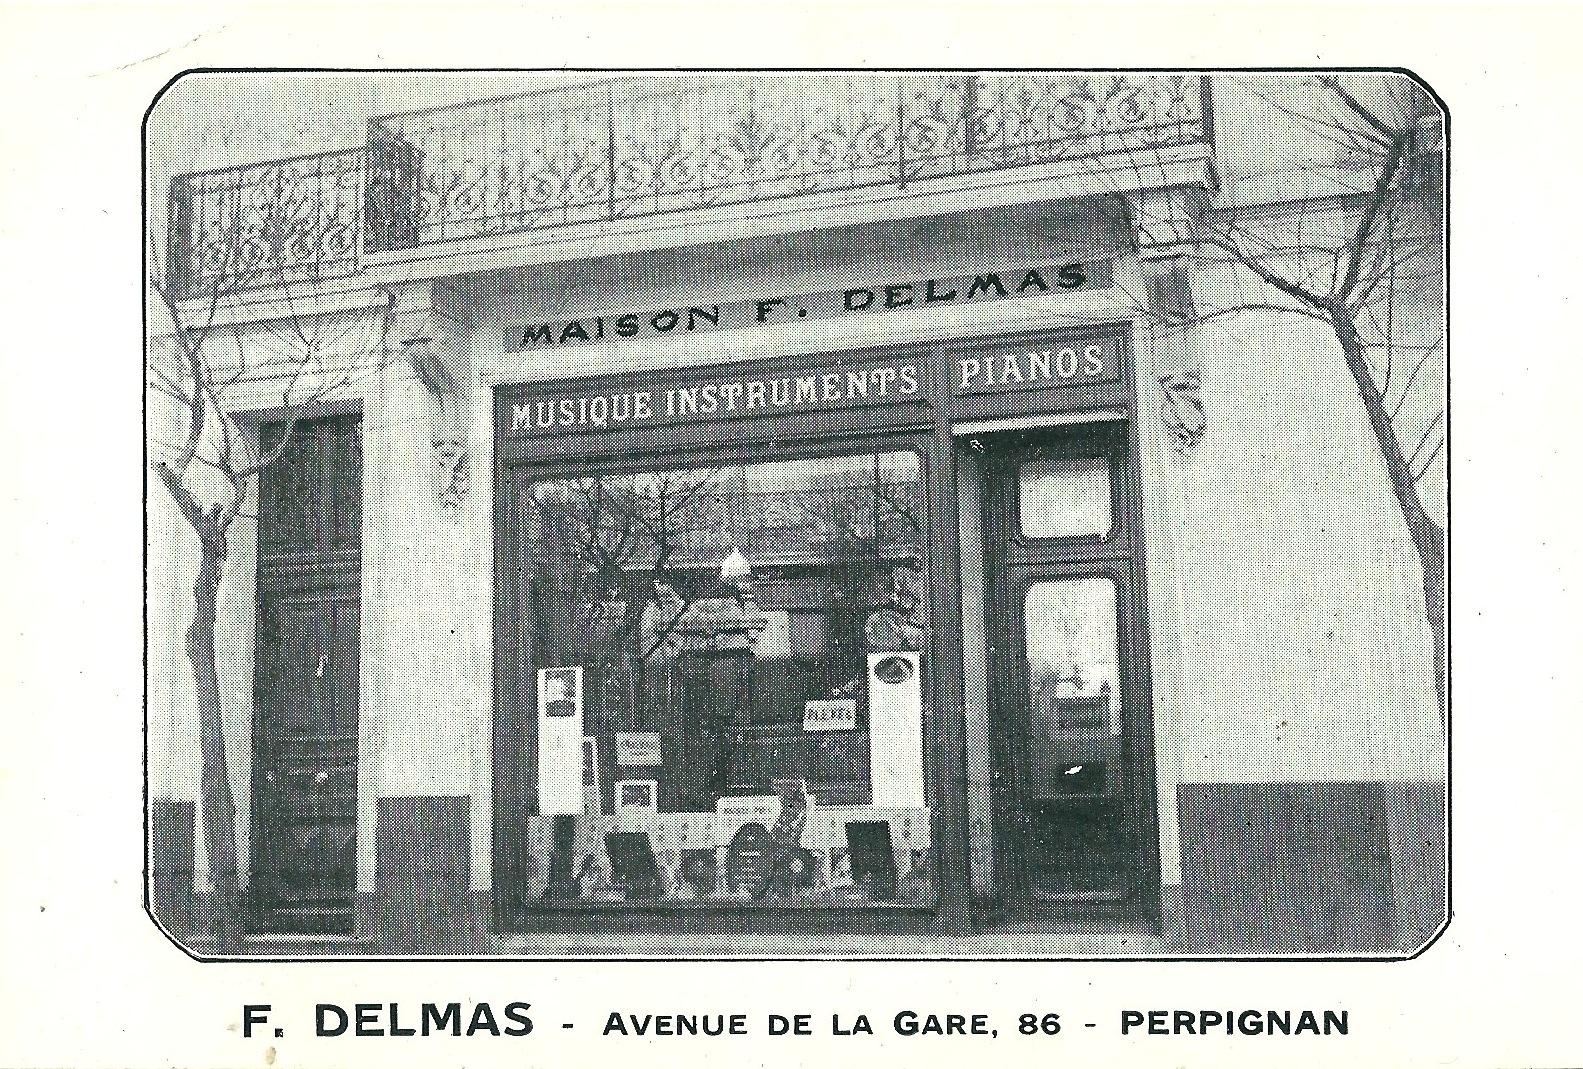 Delmas Musique Numériser La Maison Delmas s'agrandit Avenue de la Gare